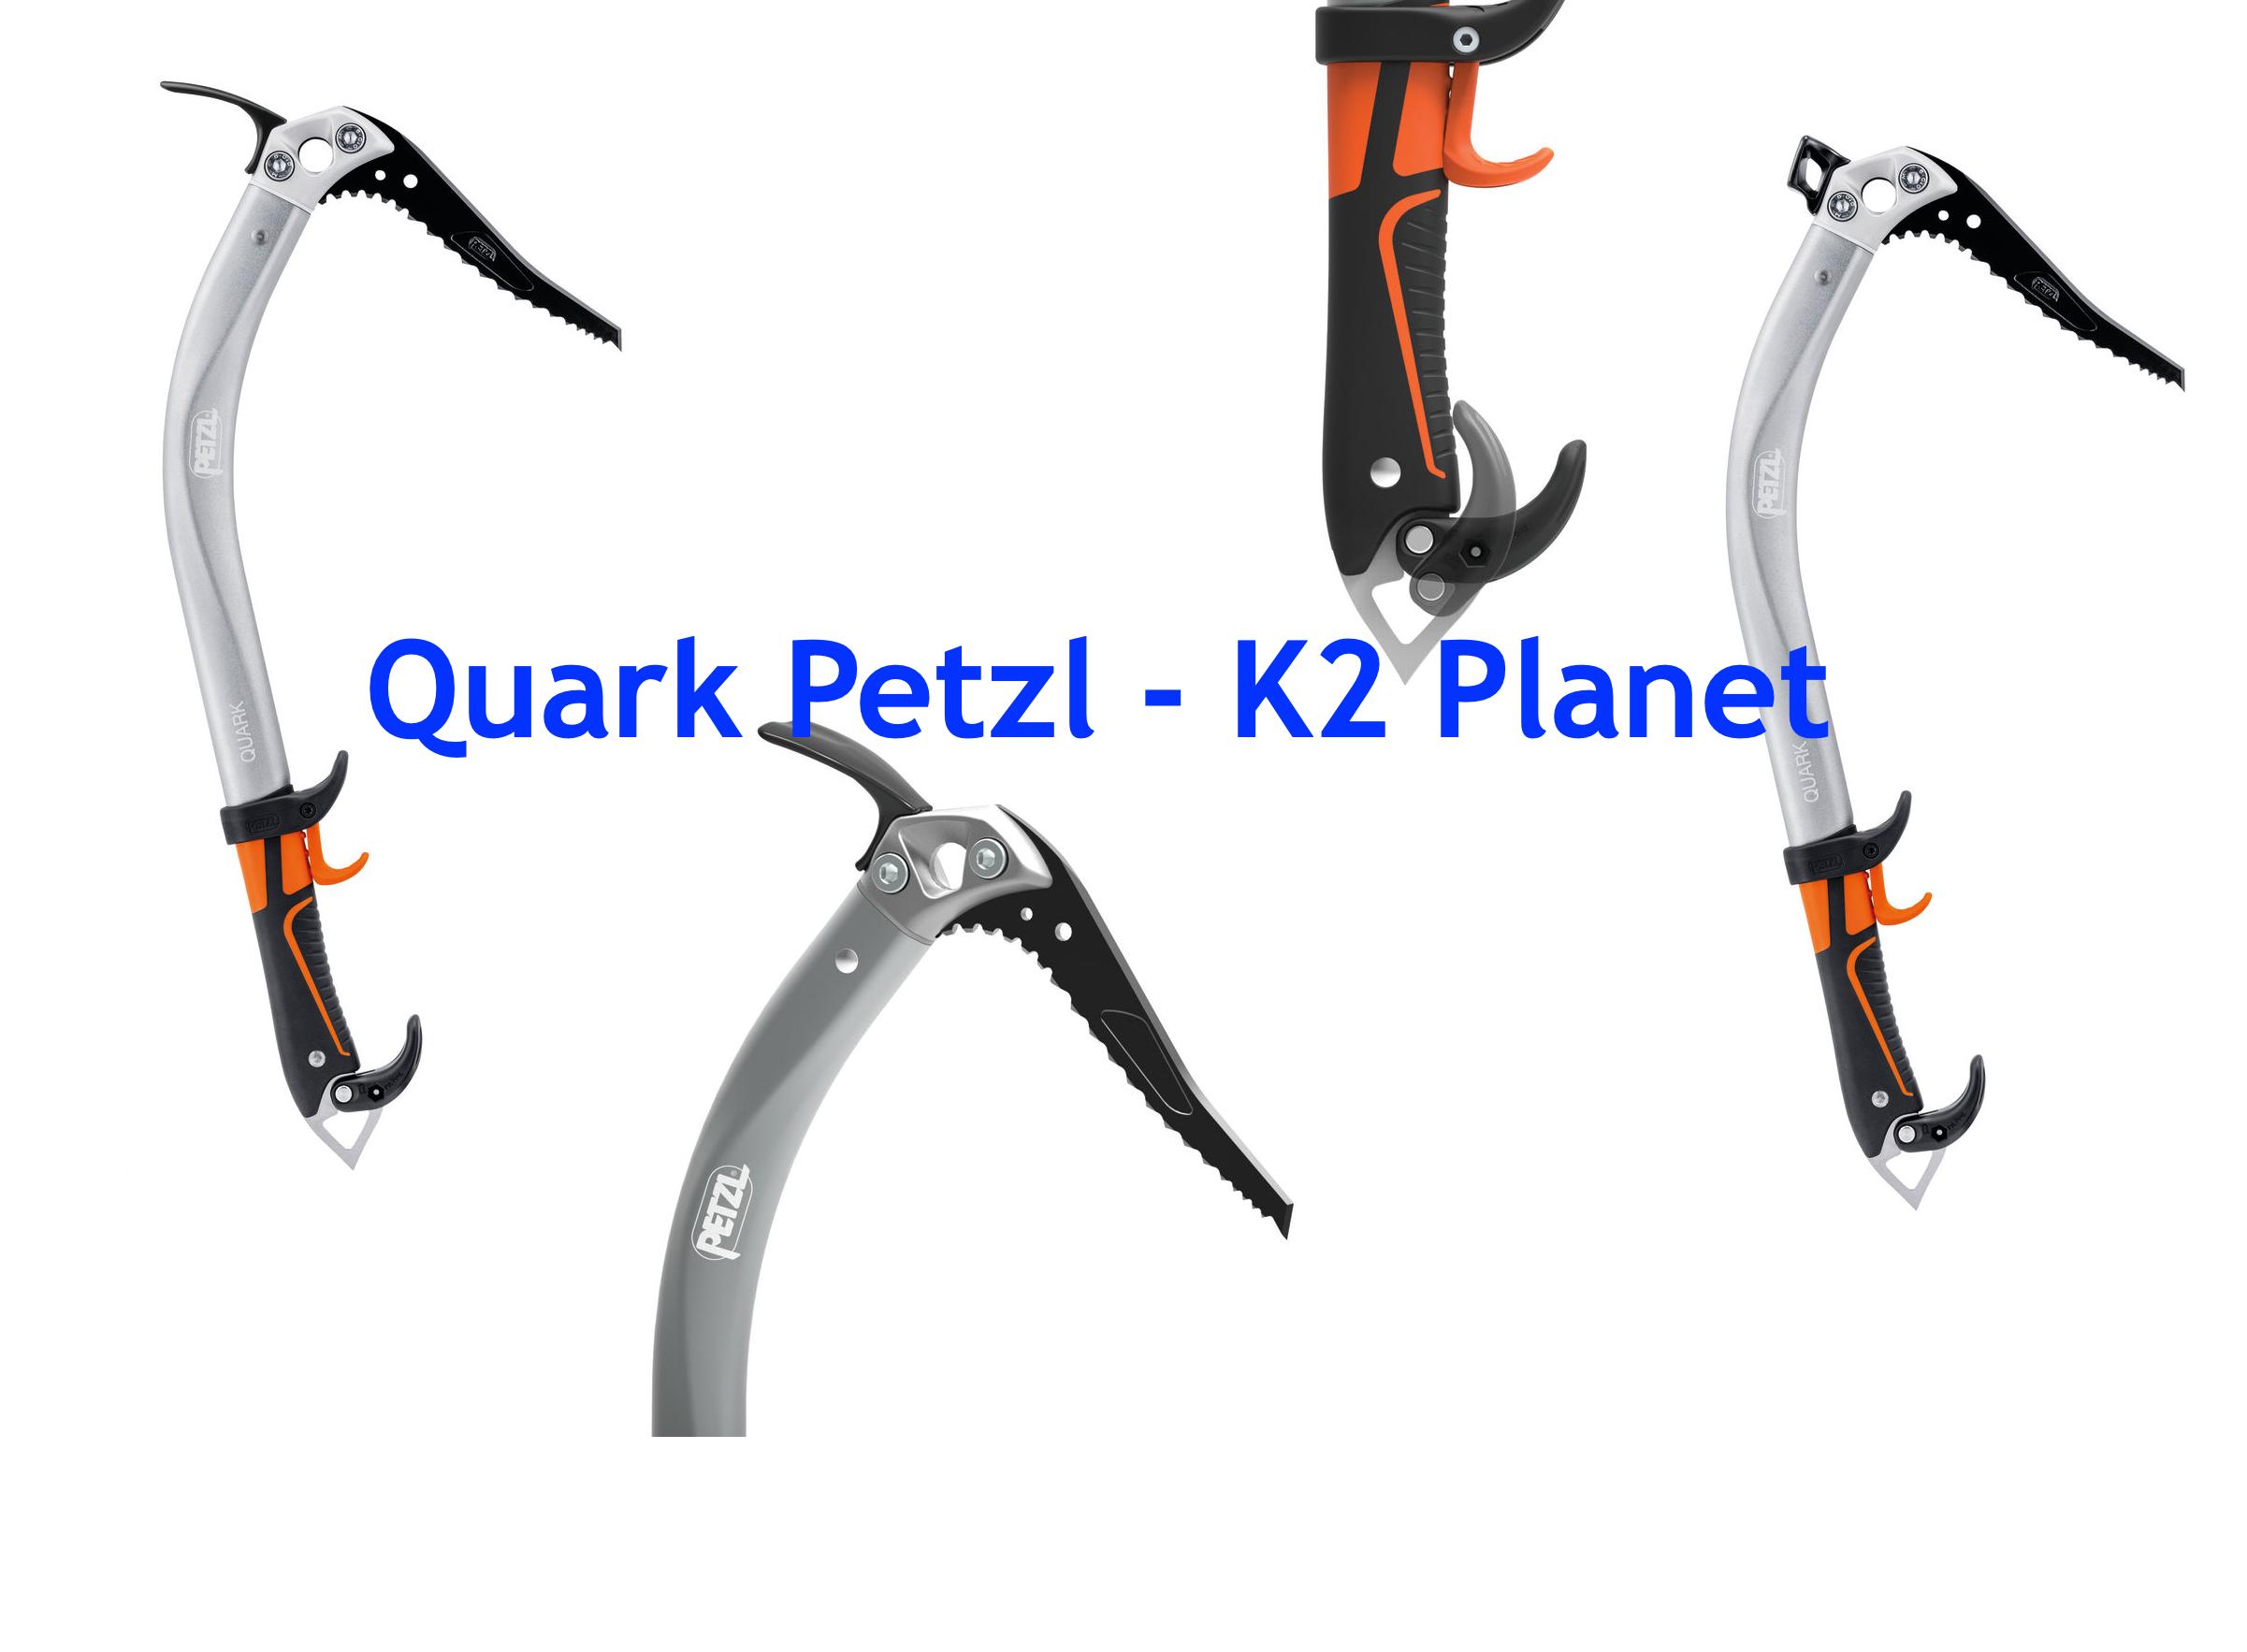 Nuevos Quark Petzl – K2 Planet